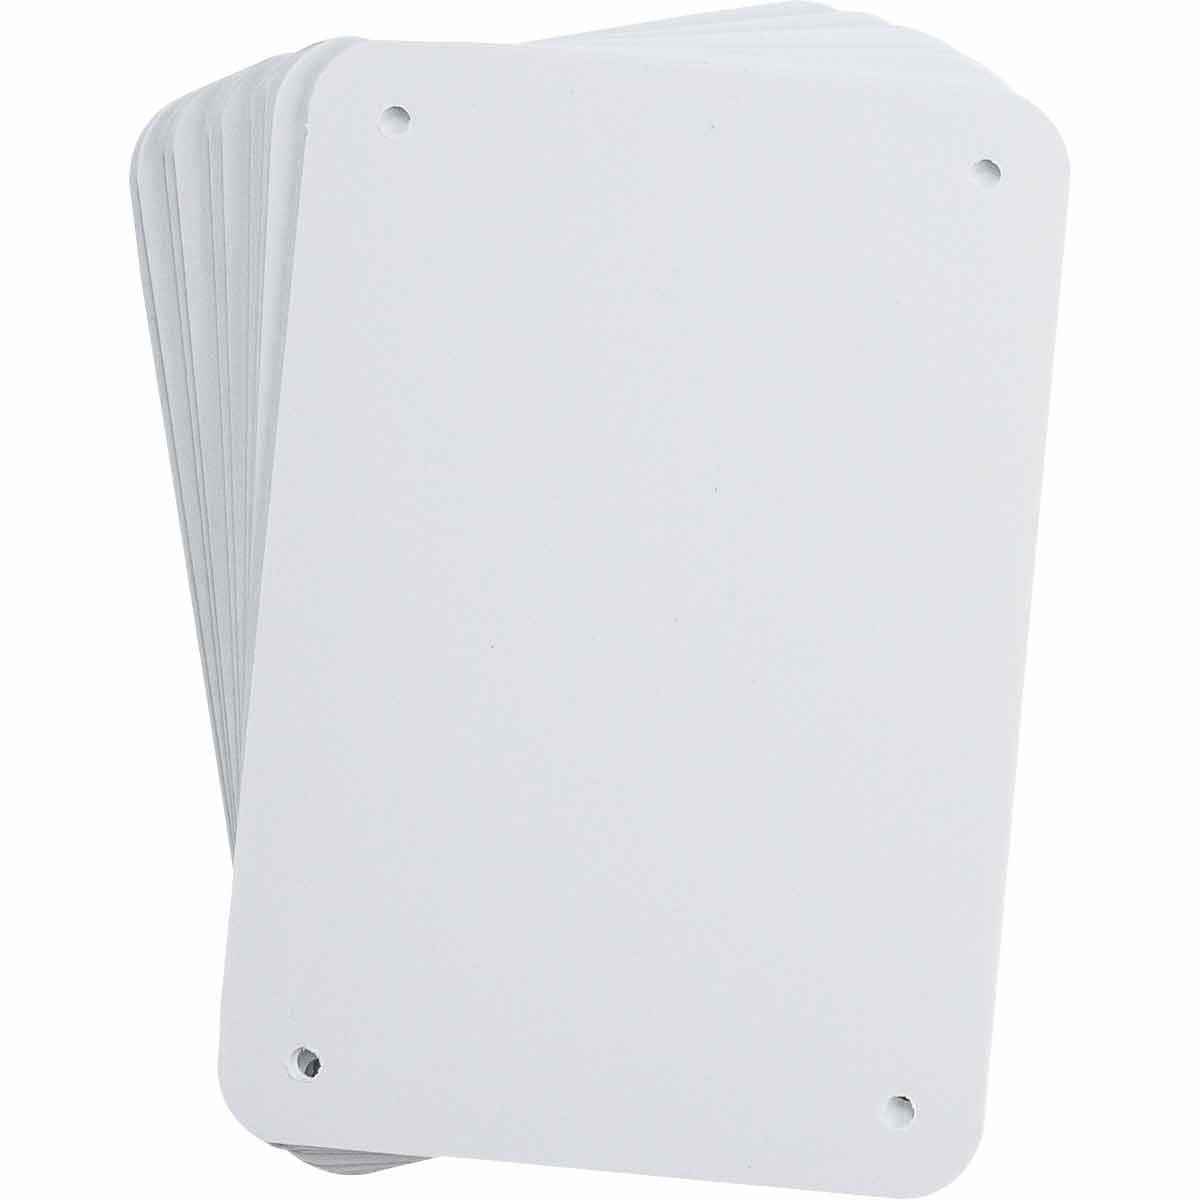 B-401 Plastic White Sign Blanks Pack of 10 Brady 13620 6.25 Width x 4.25 Height